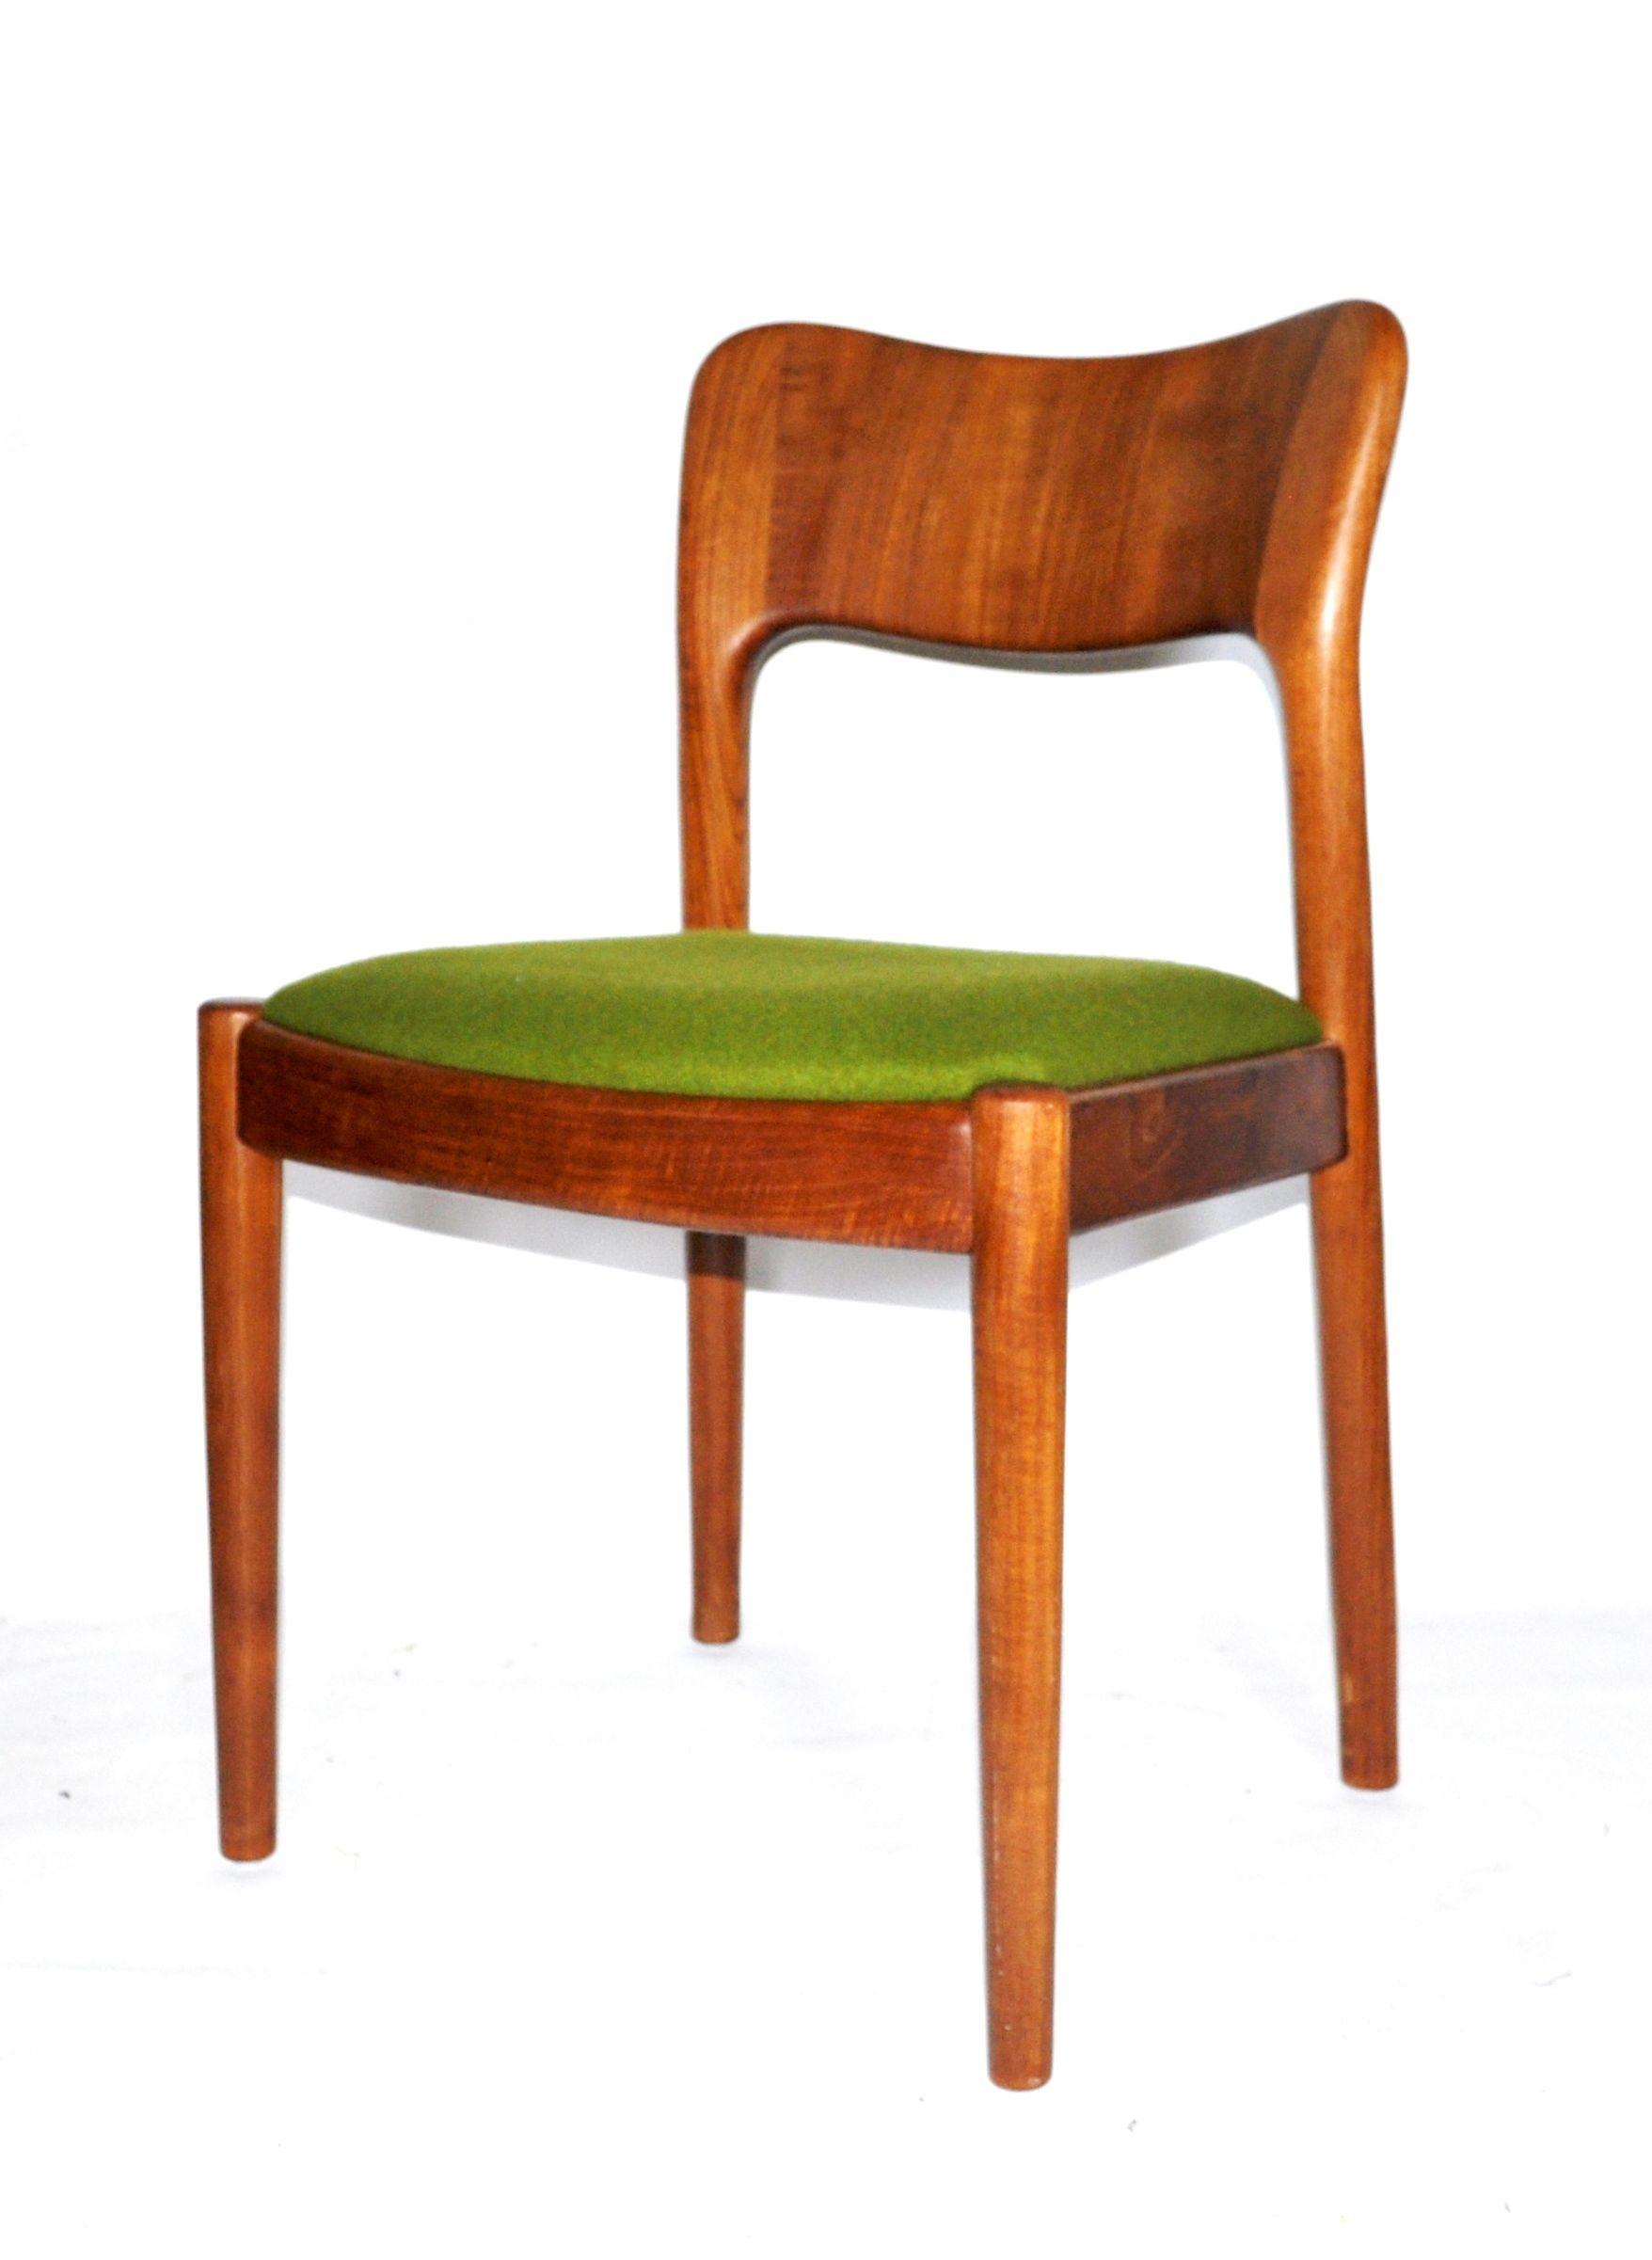 Rare Solid Teak Danish Desk Chair By Koefoeds Hornslet Mid Century Modern Danish Modern Table Danish Desk Mid Century Modern